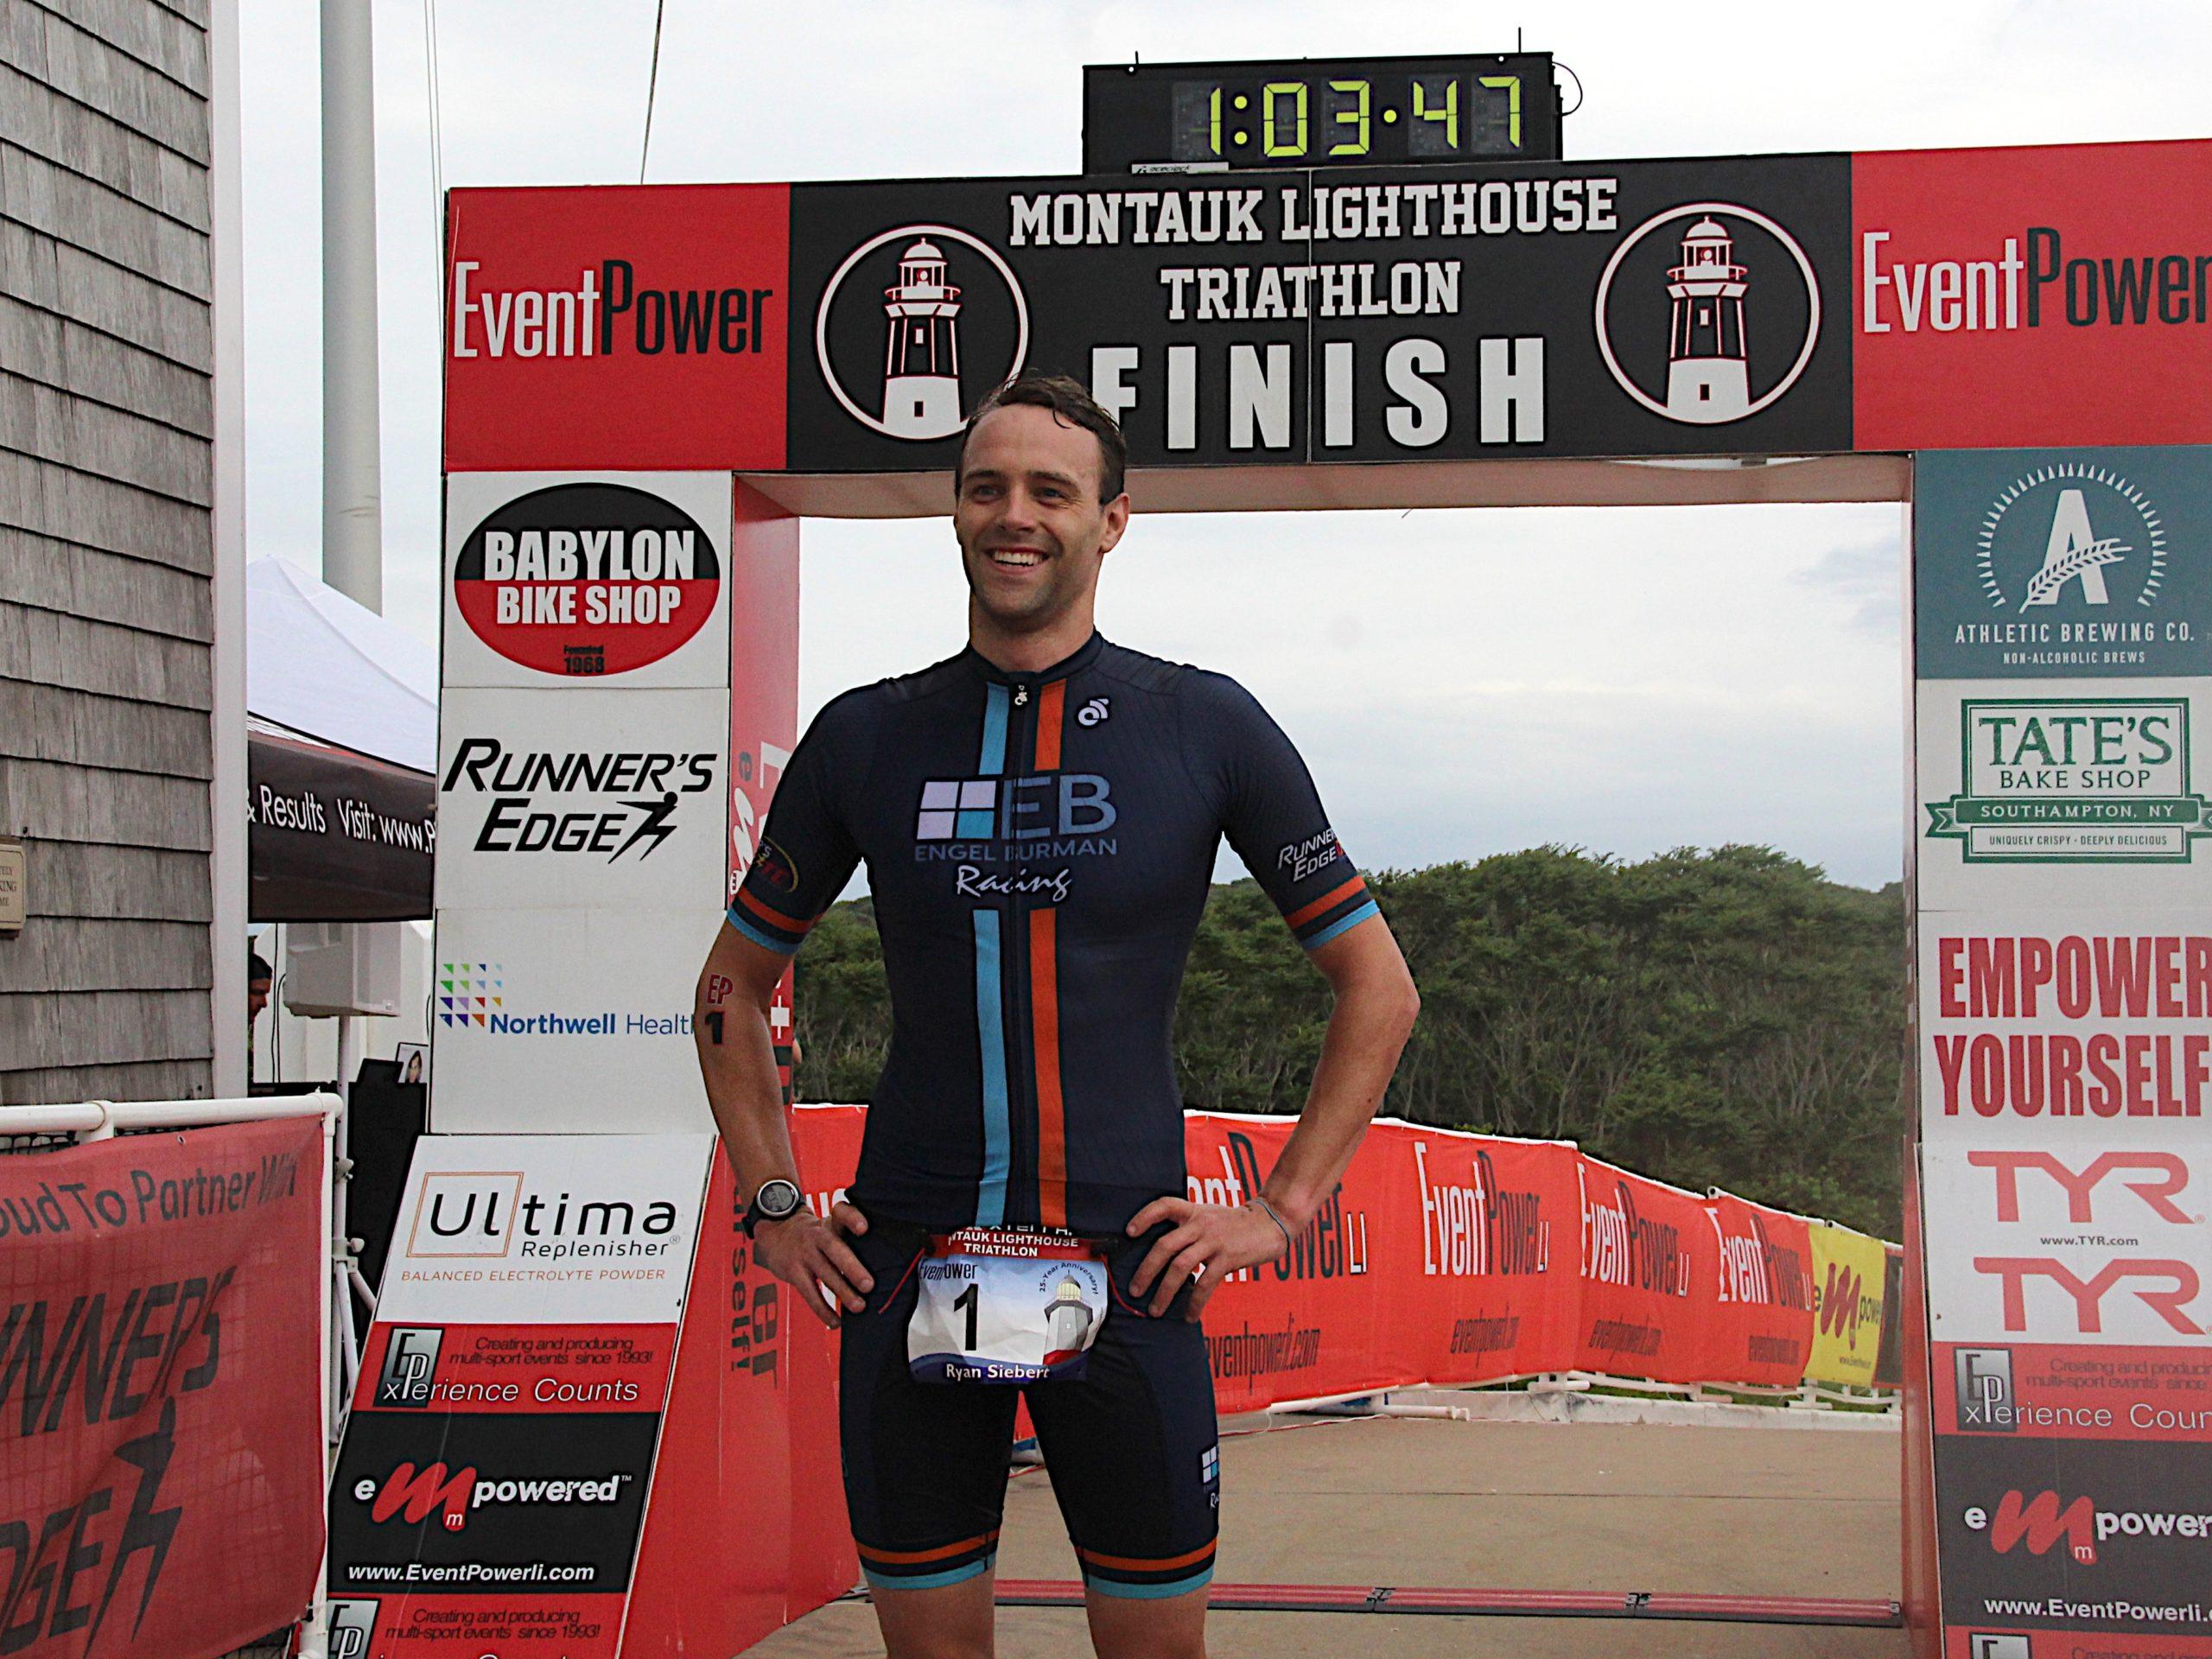 Tom Eikelberg was the winner of the 25th annual Montauk Lighthouse Triathlon on Sunday morning.